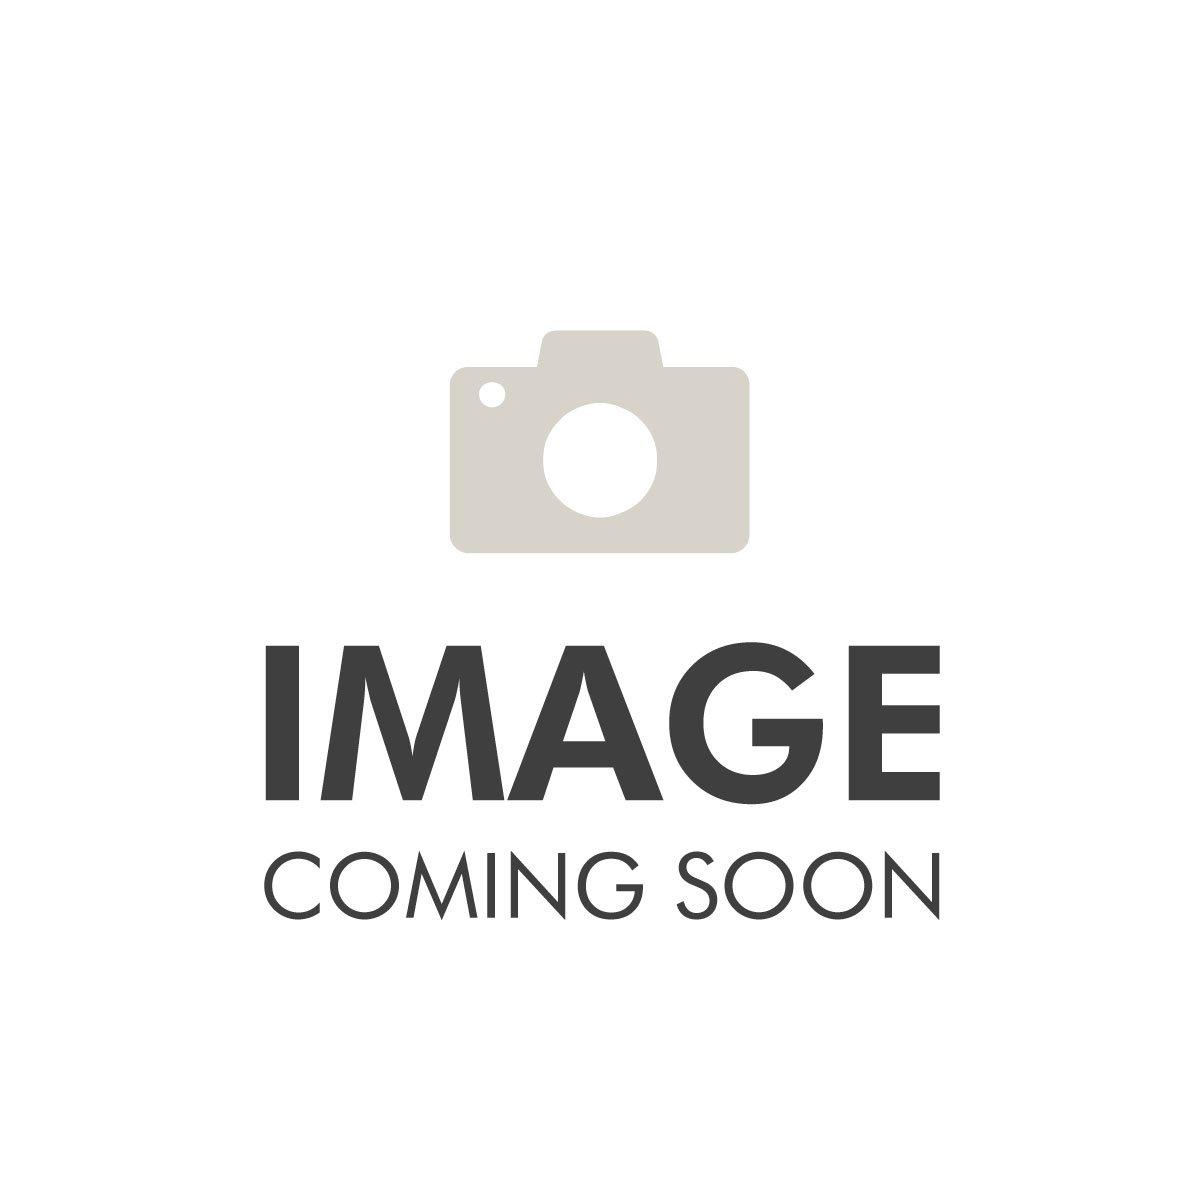 Eden Classic Dana Mandate Aftershave 50ml for men